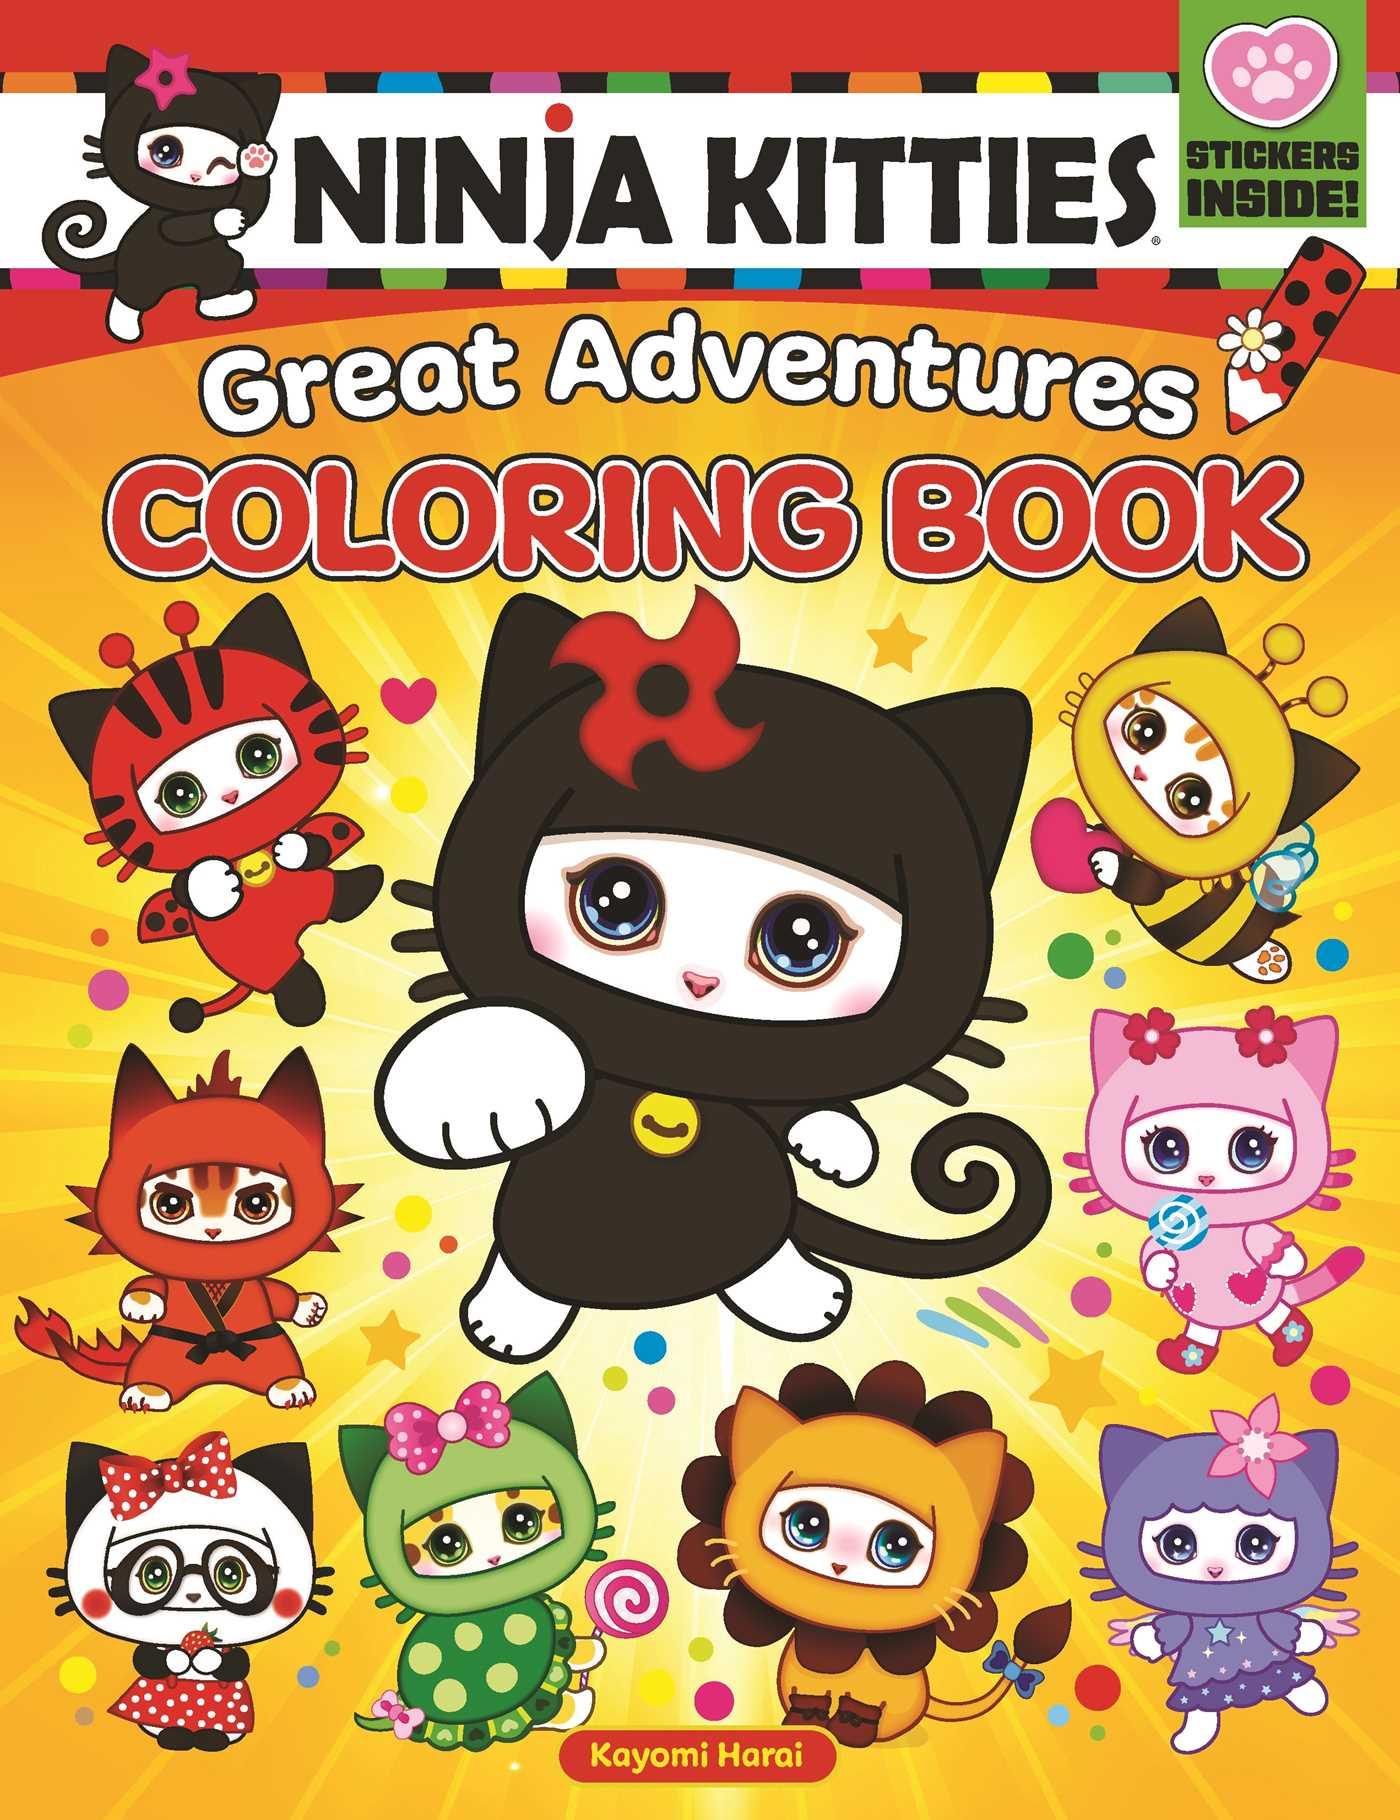 Picture of Ninja Kitties Great Adventures Coloring Book